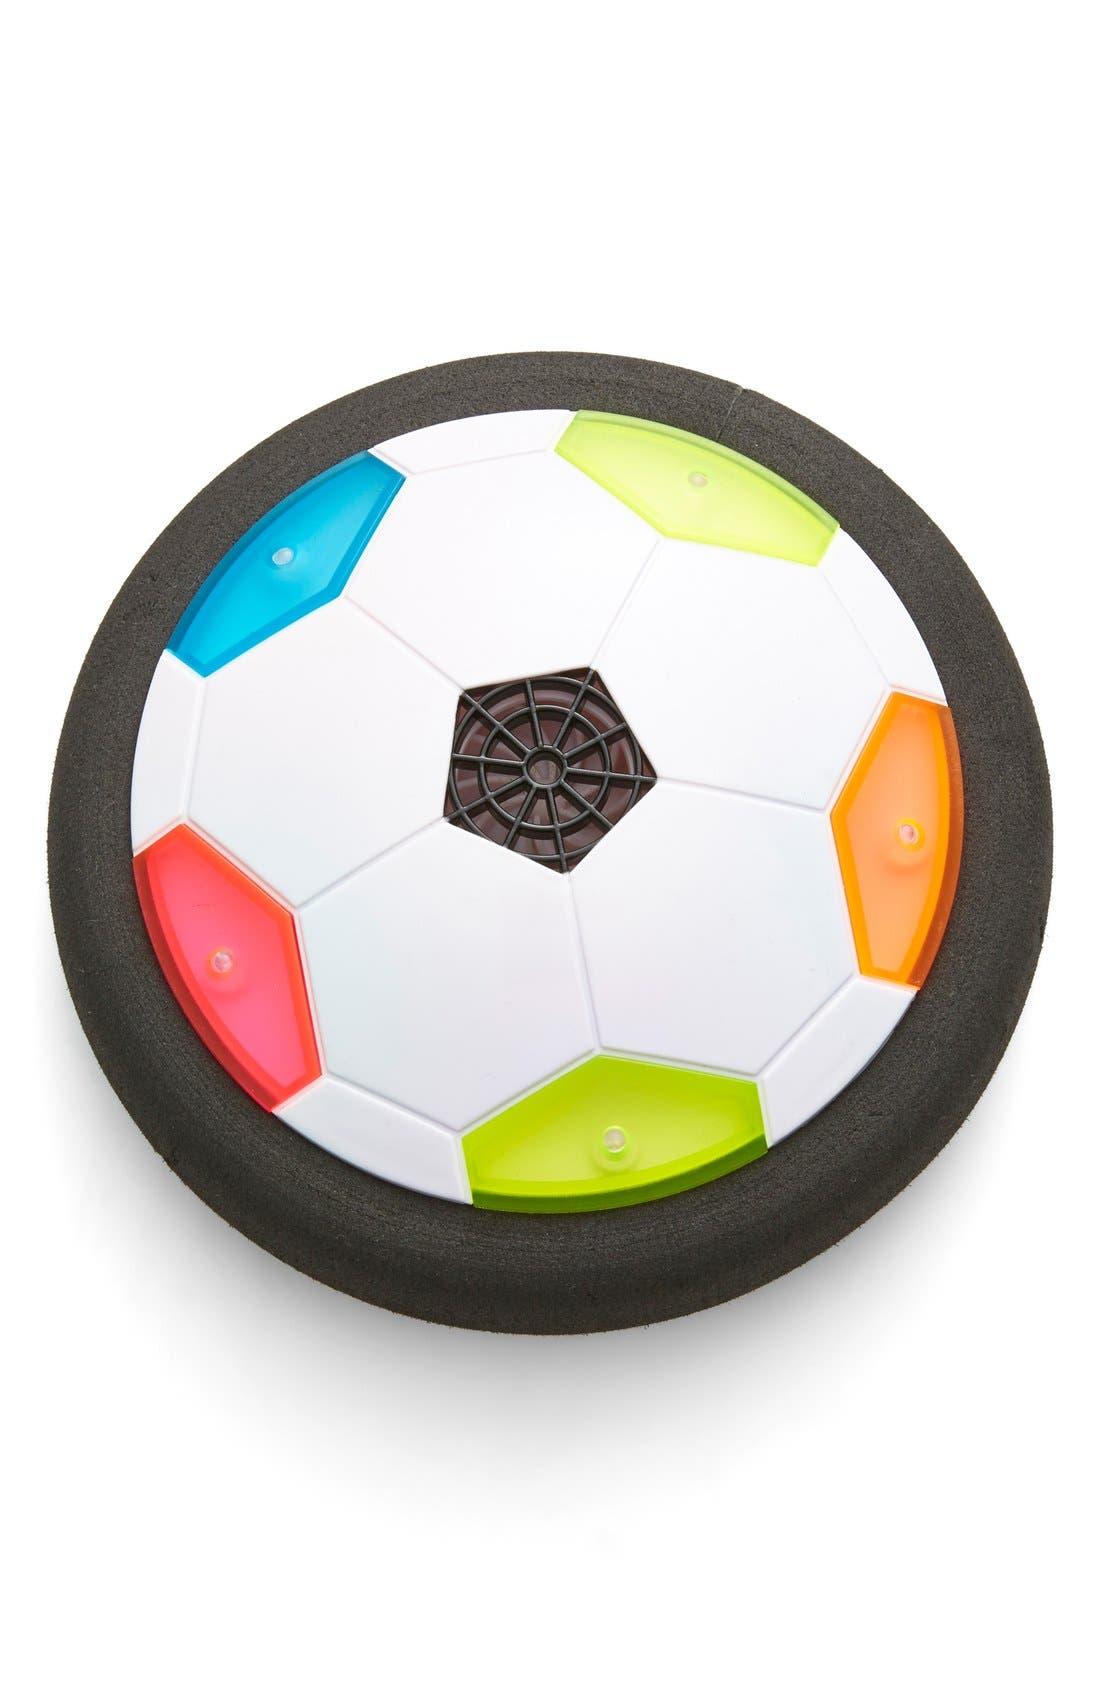 Can You Imagine UltraGlow Light-Up Air Power Soccer Disk